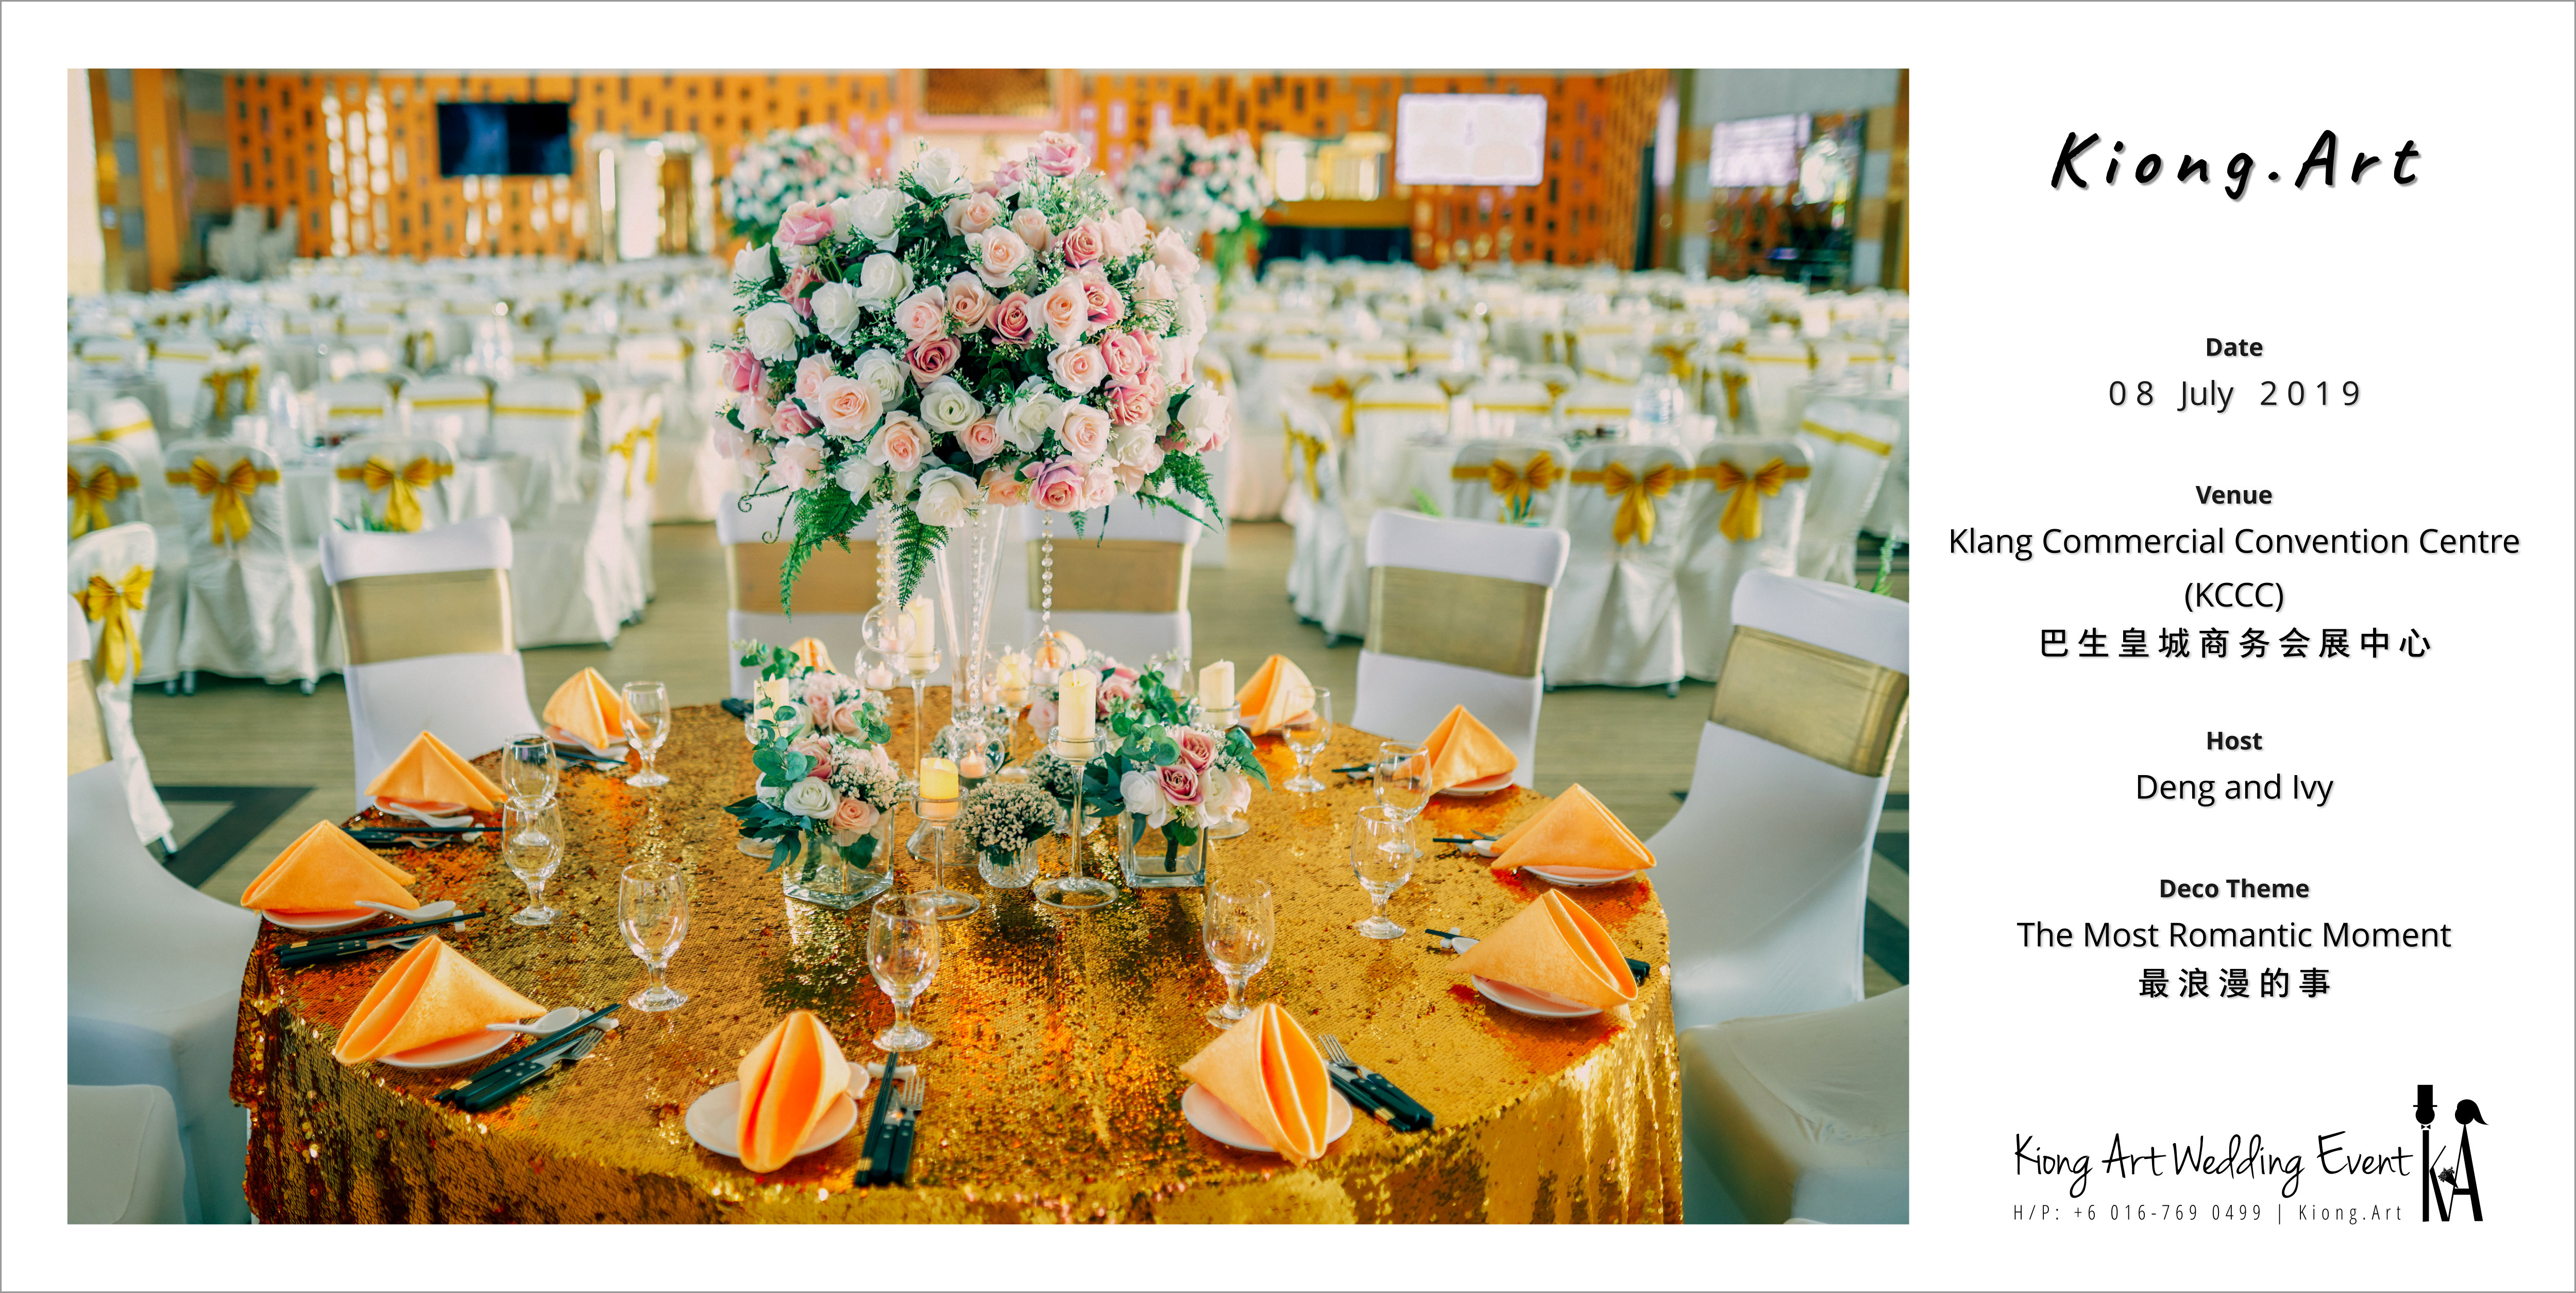 Kuala Lumpur Wedding Event Deco Wedding Planner Kiong Art Wedding Event 吉隆坡一站式婚礼策划布置 Klang Commercial Convention Centre KCCC 巴生皇城商务会展中心 A00-001